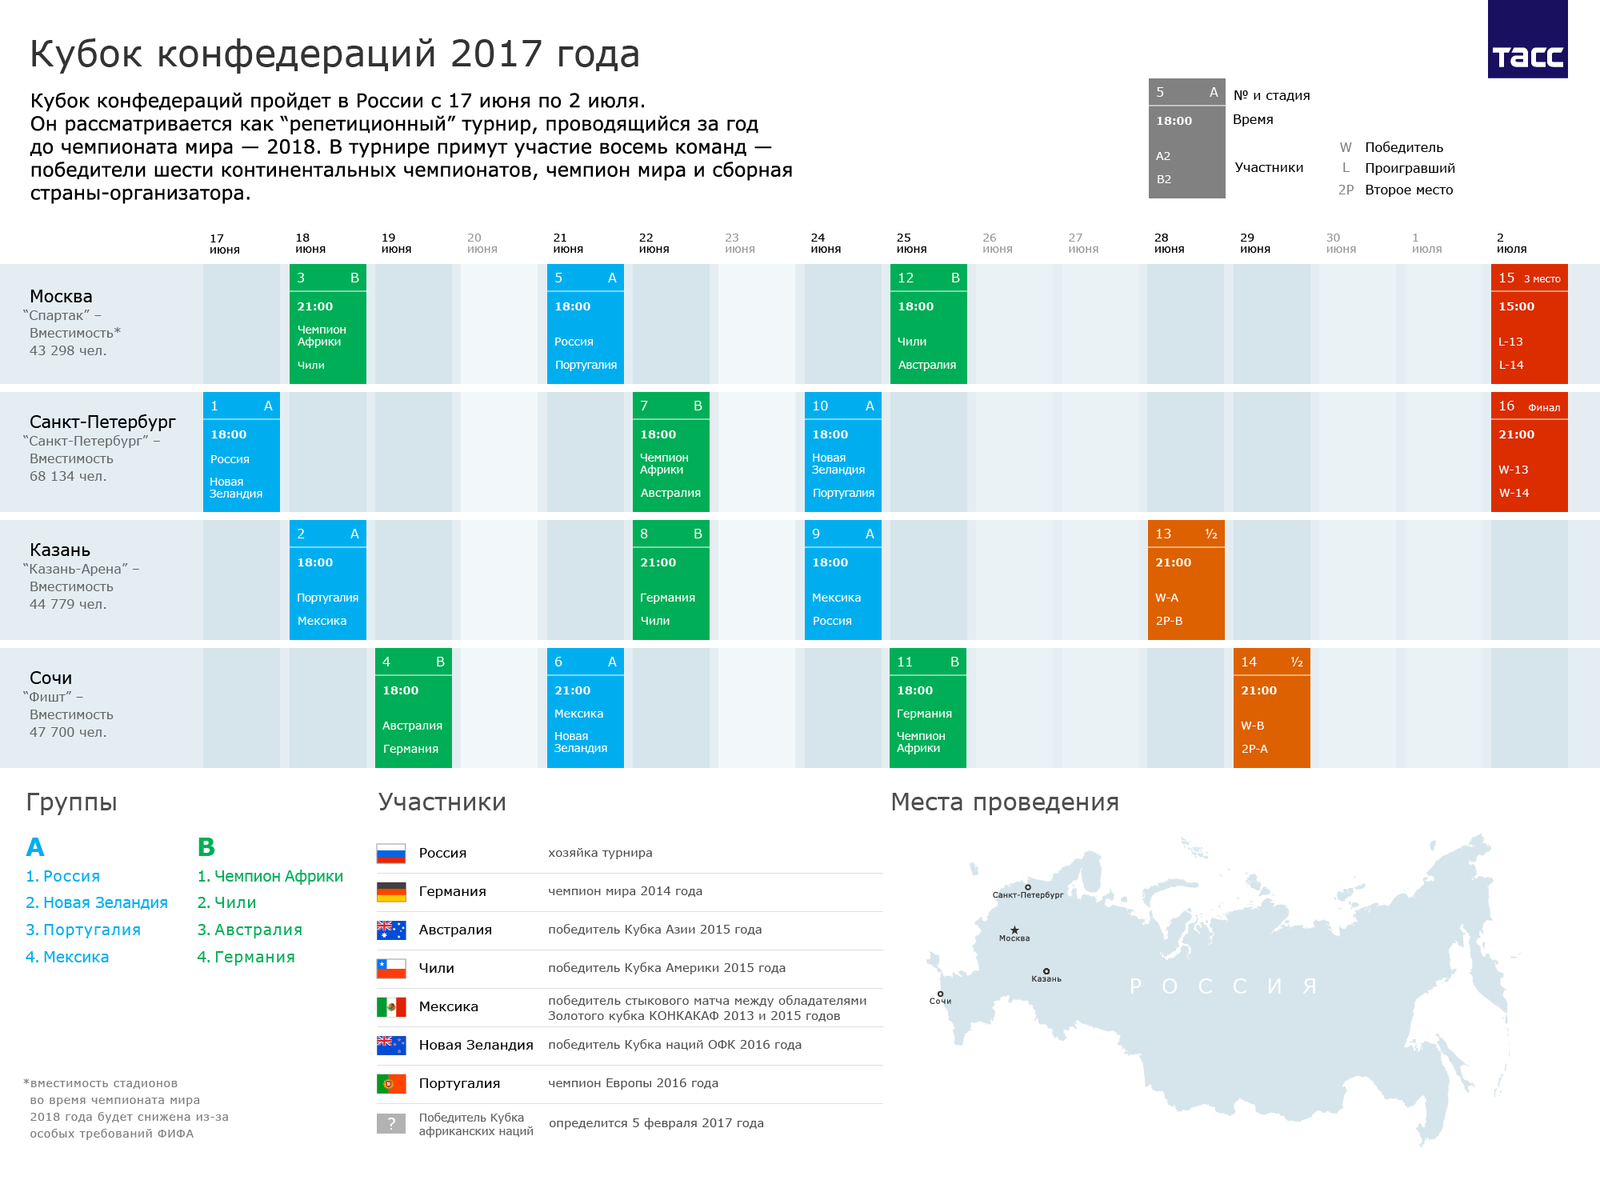 Кубок Конфедераций-2017: онлайн-трансляция жеребьевки вКазани